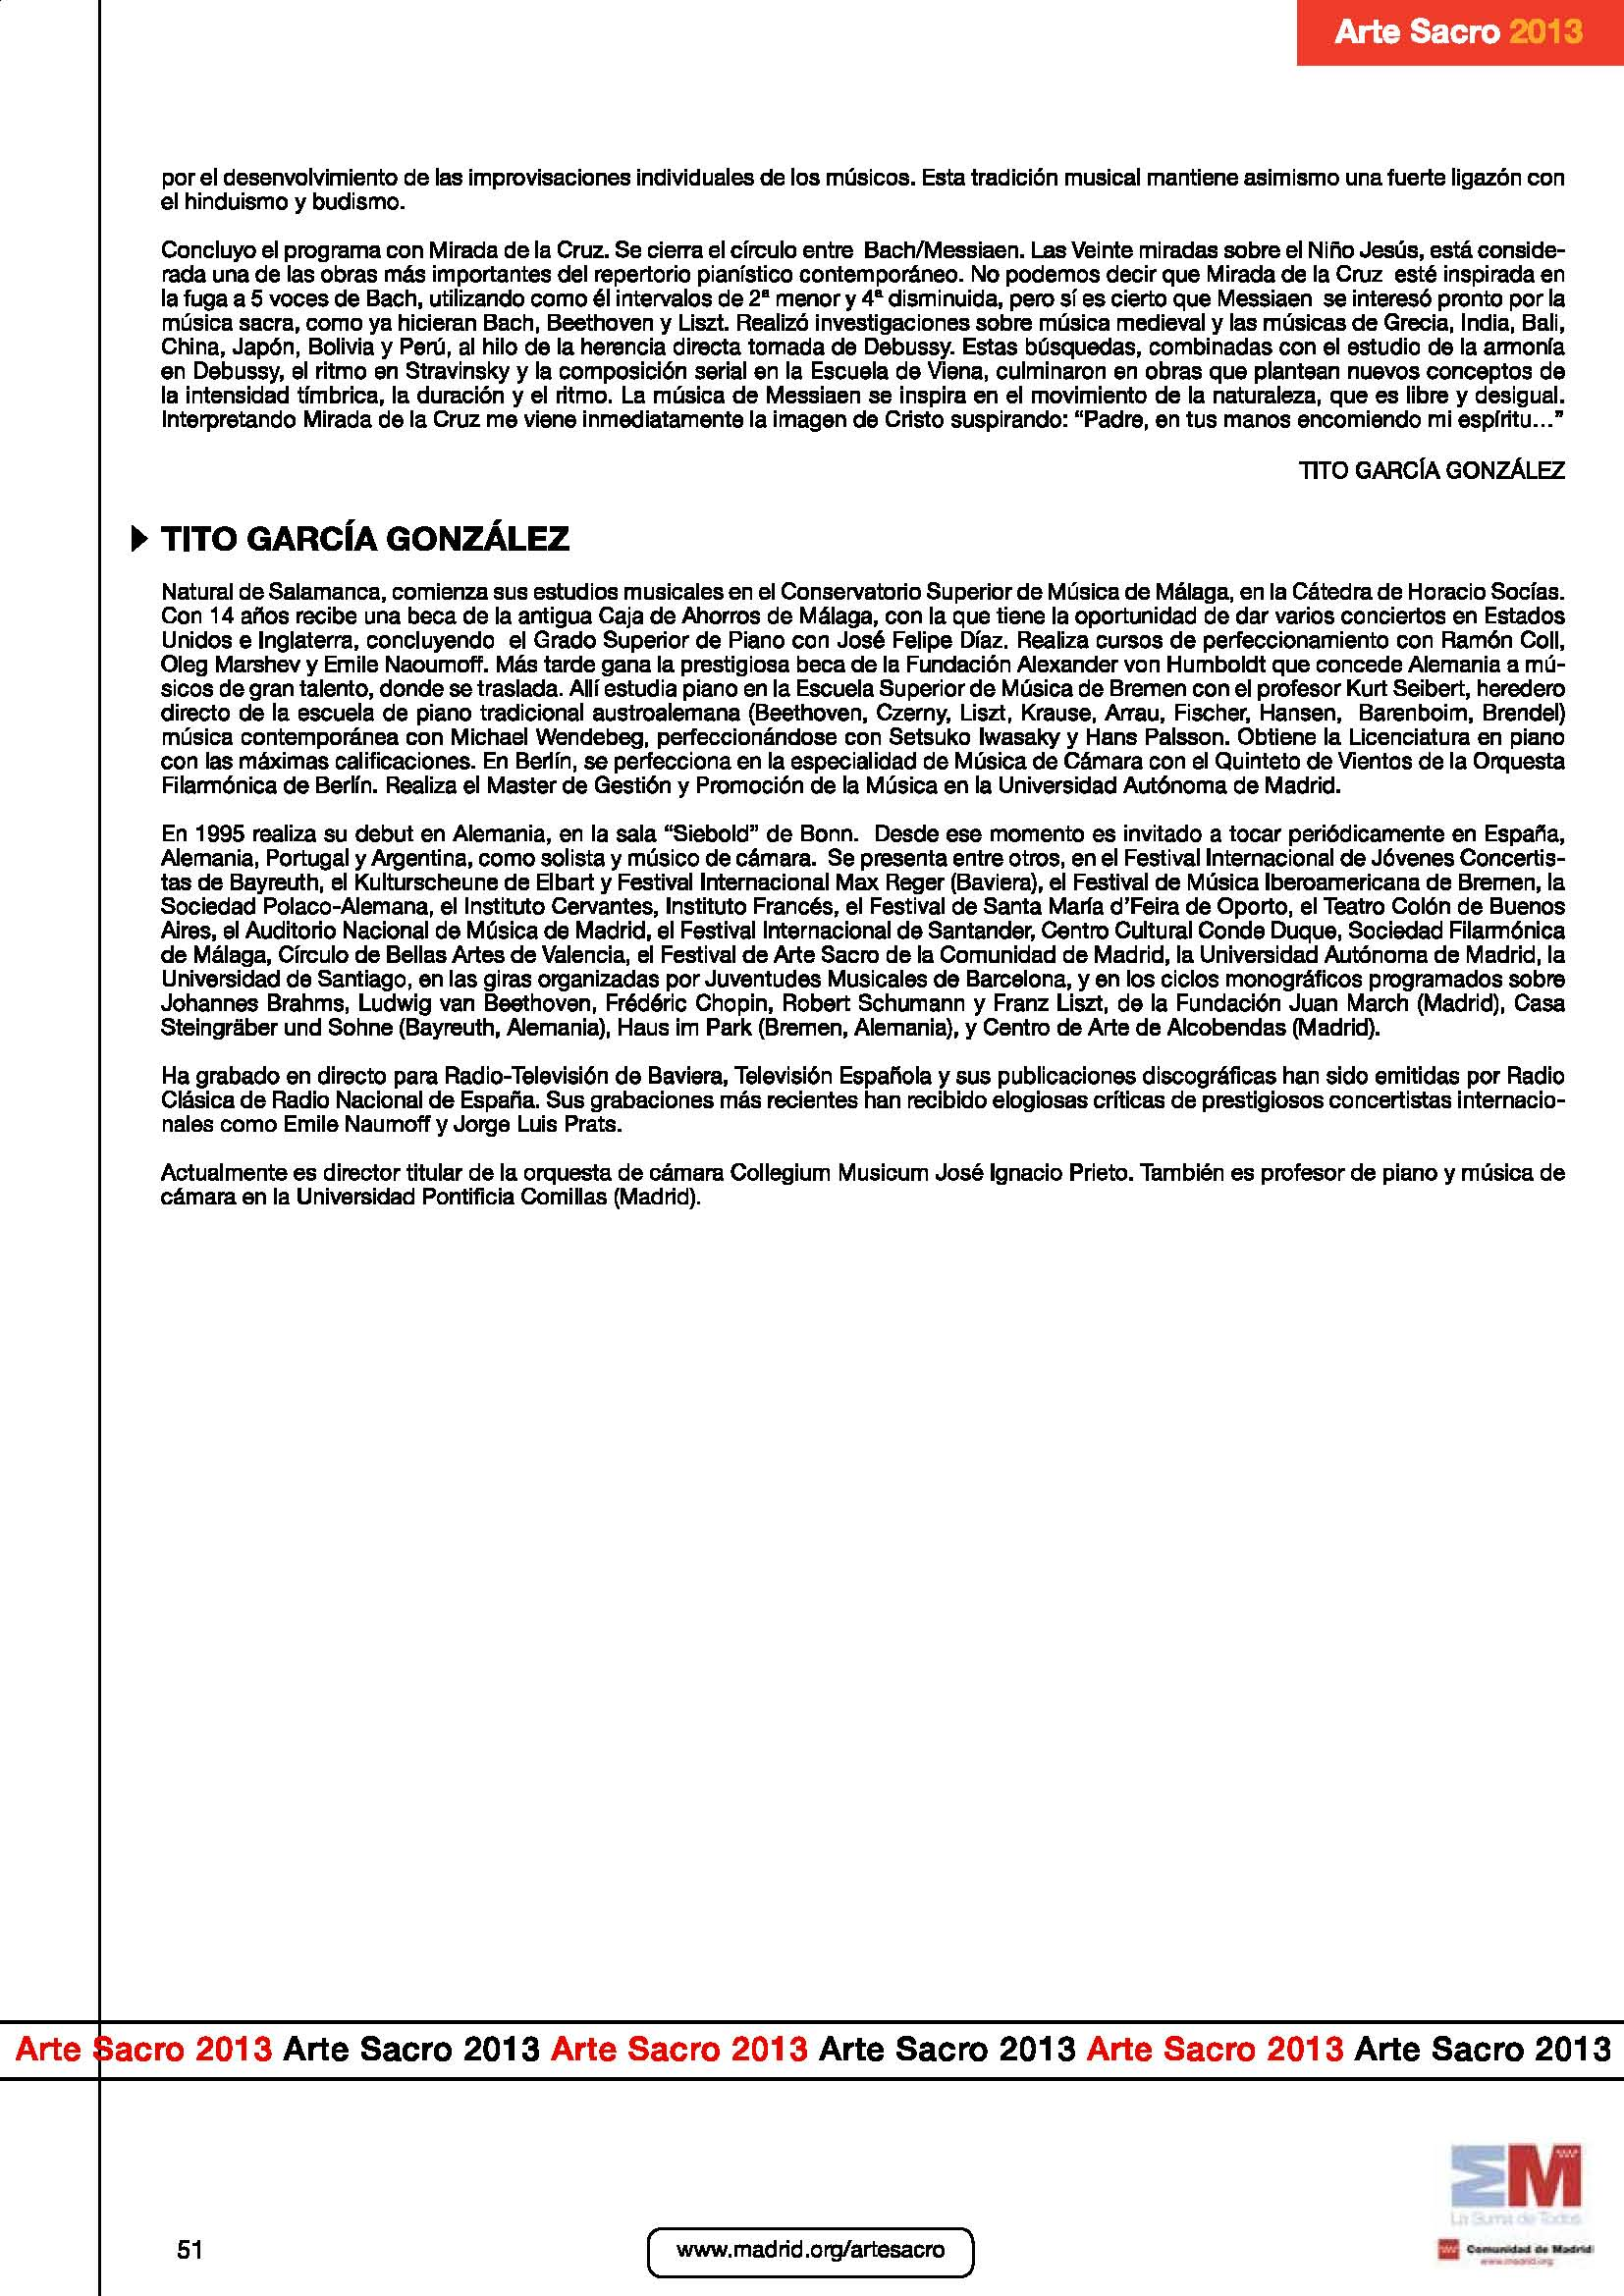 dossier_completo_Página_051